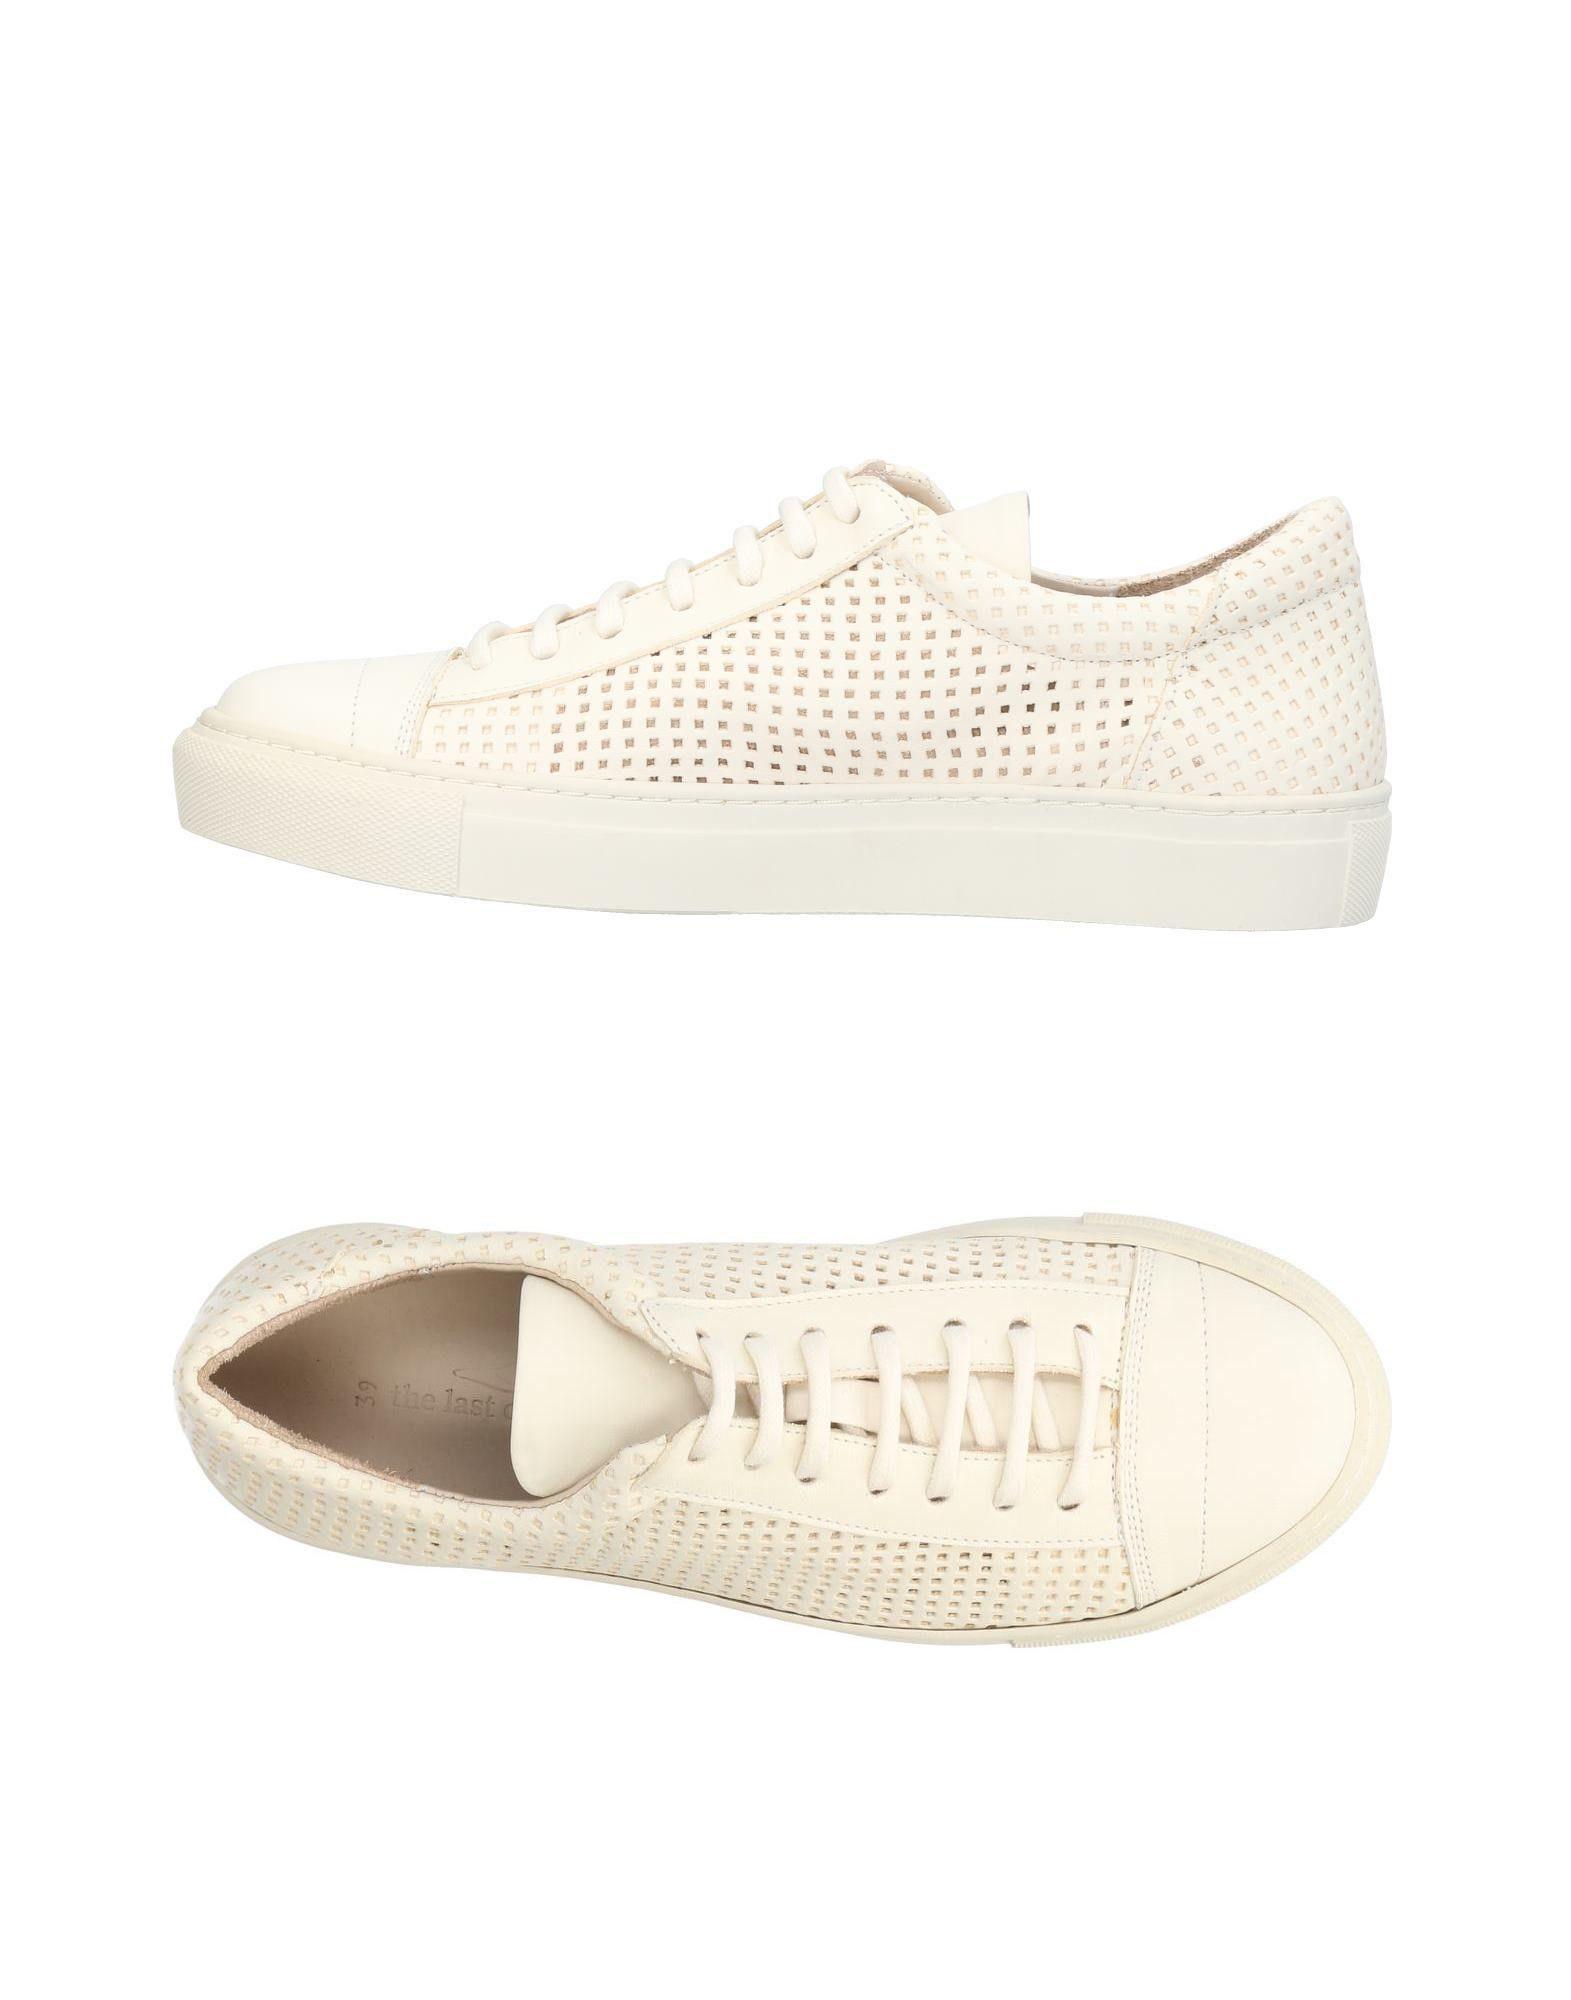 Sneakers The Last Conspiracy Uomo - Acquista online su